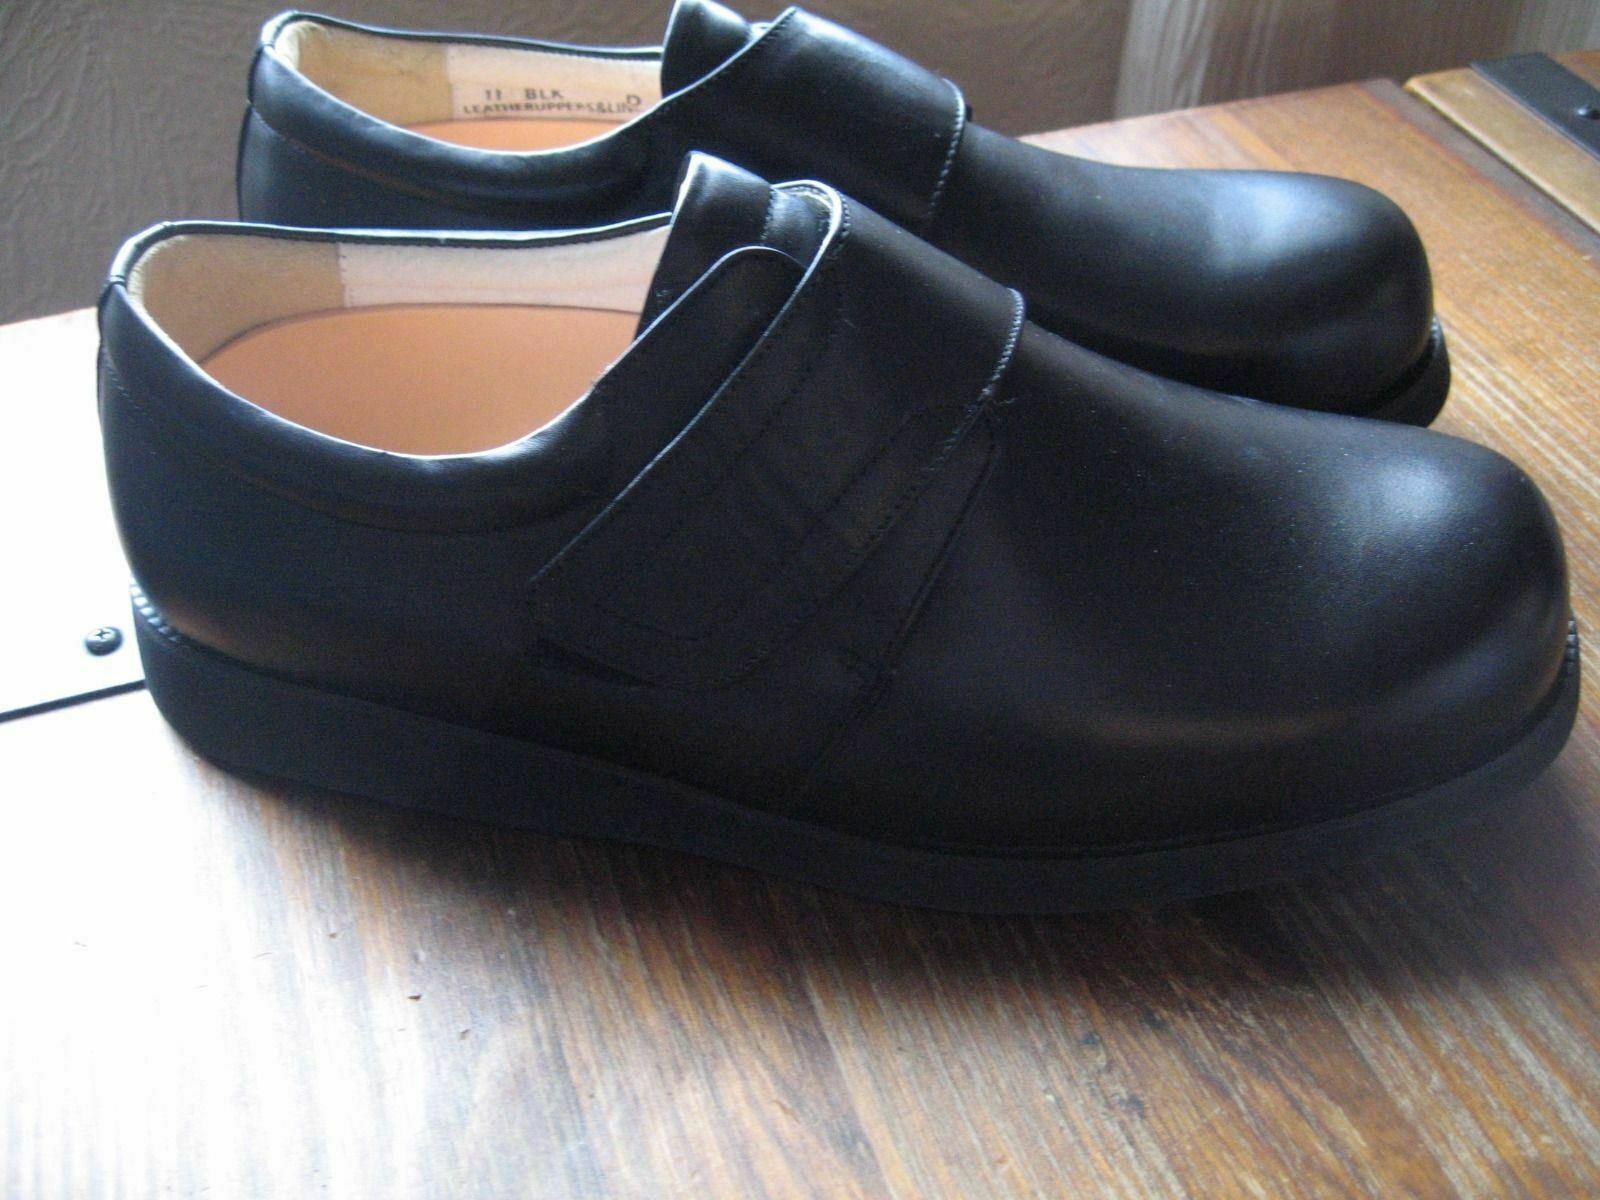 New-Mt. Emey Slap-Over Strap Men's Therapeutic Extra Depth shoes Size 11 D (A036)